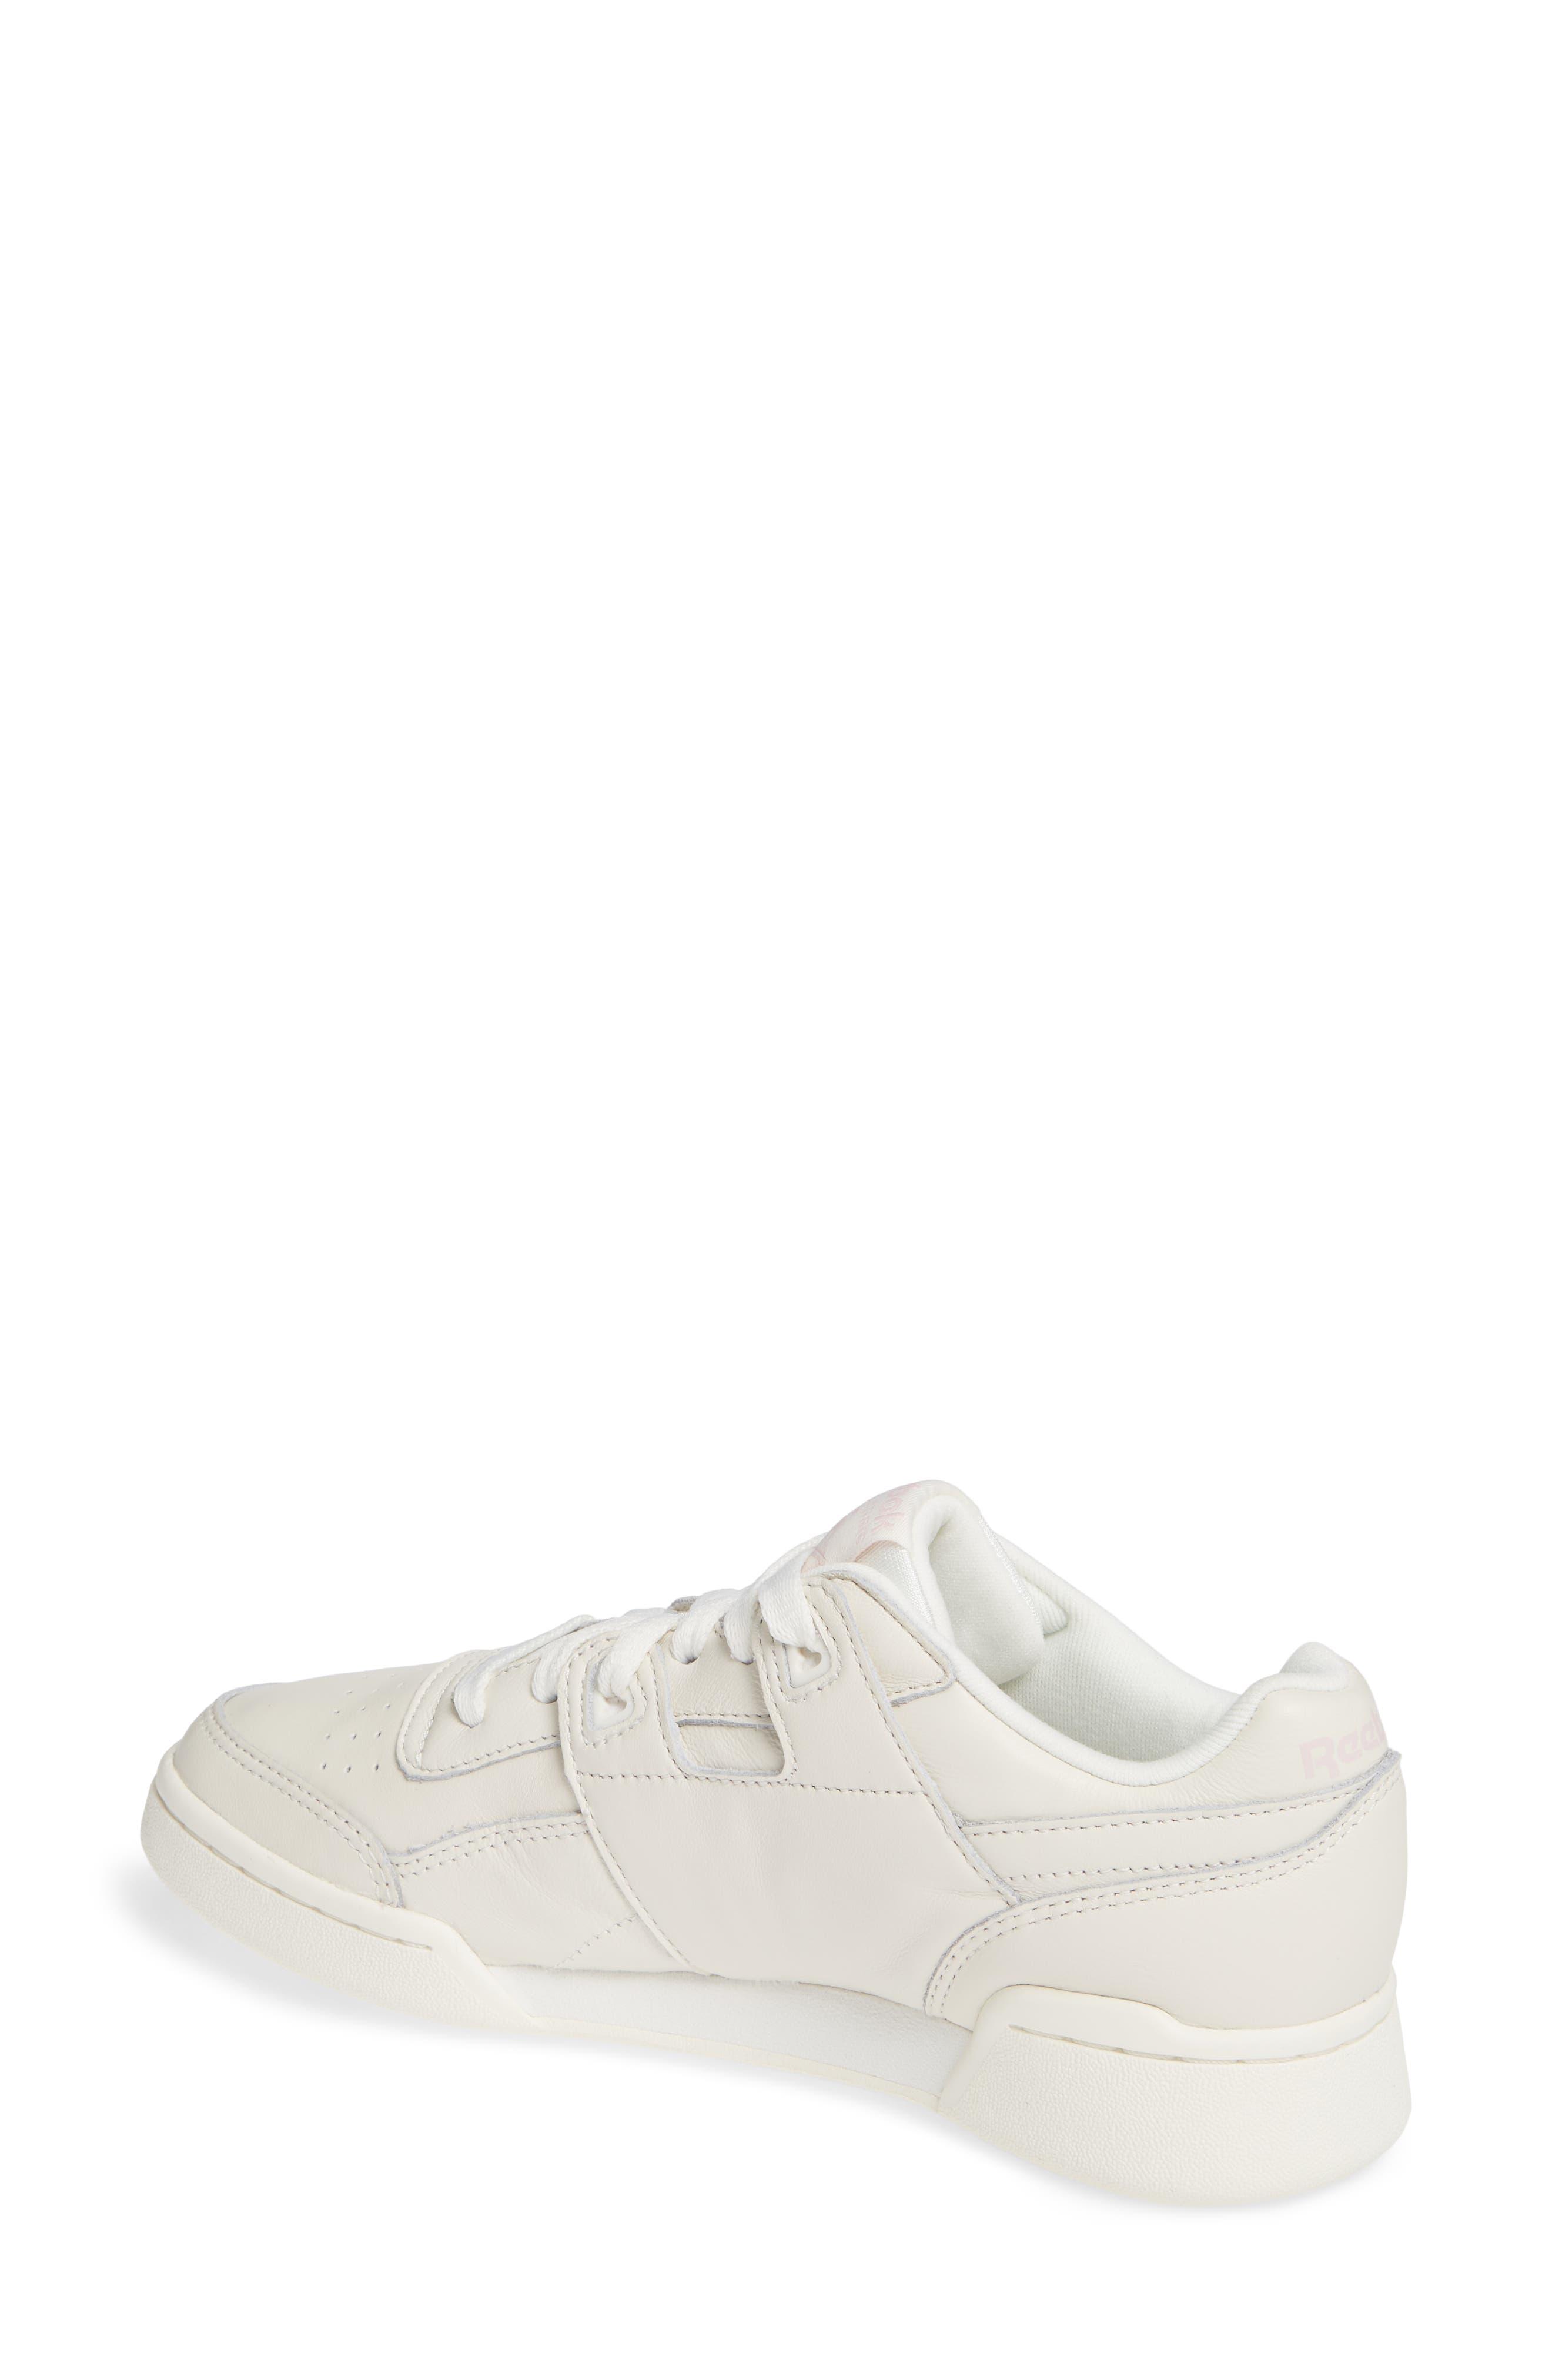 Workout Low Plus Sneaker,                             Alternate thumbnail 2, color,                             WHITE/ PRACTICAL PINK